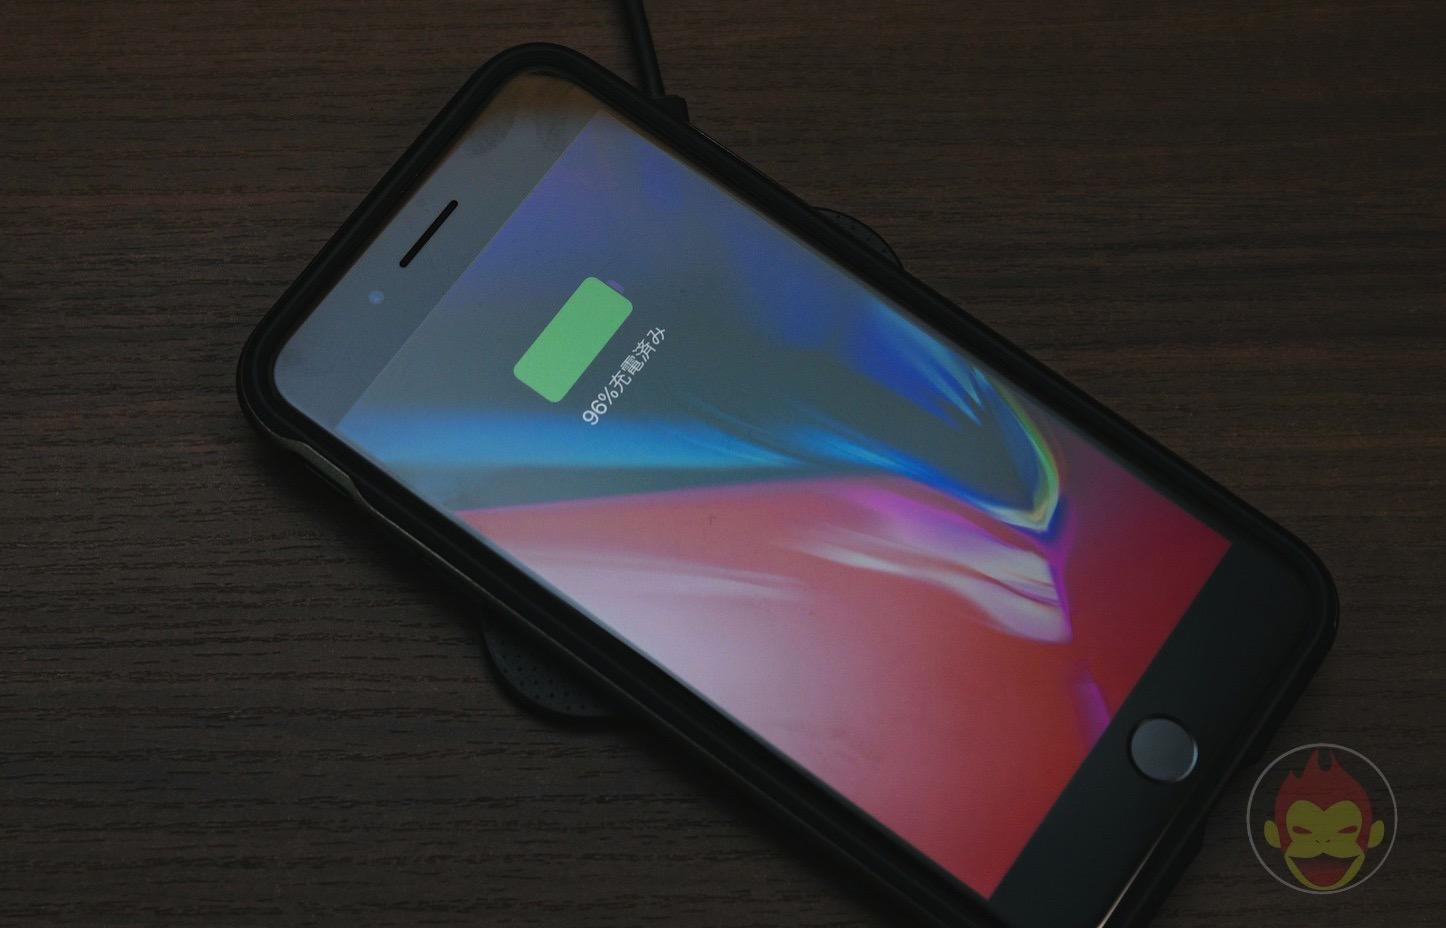 Spigen-Neo-Hybird-2-iPHone8Plus-Case-Review-Charging-01.jpg